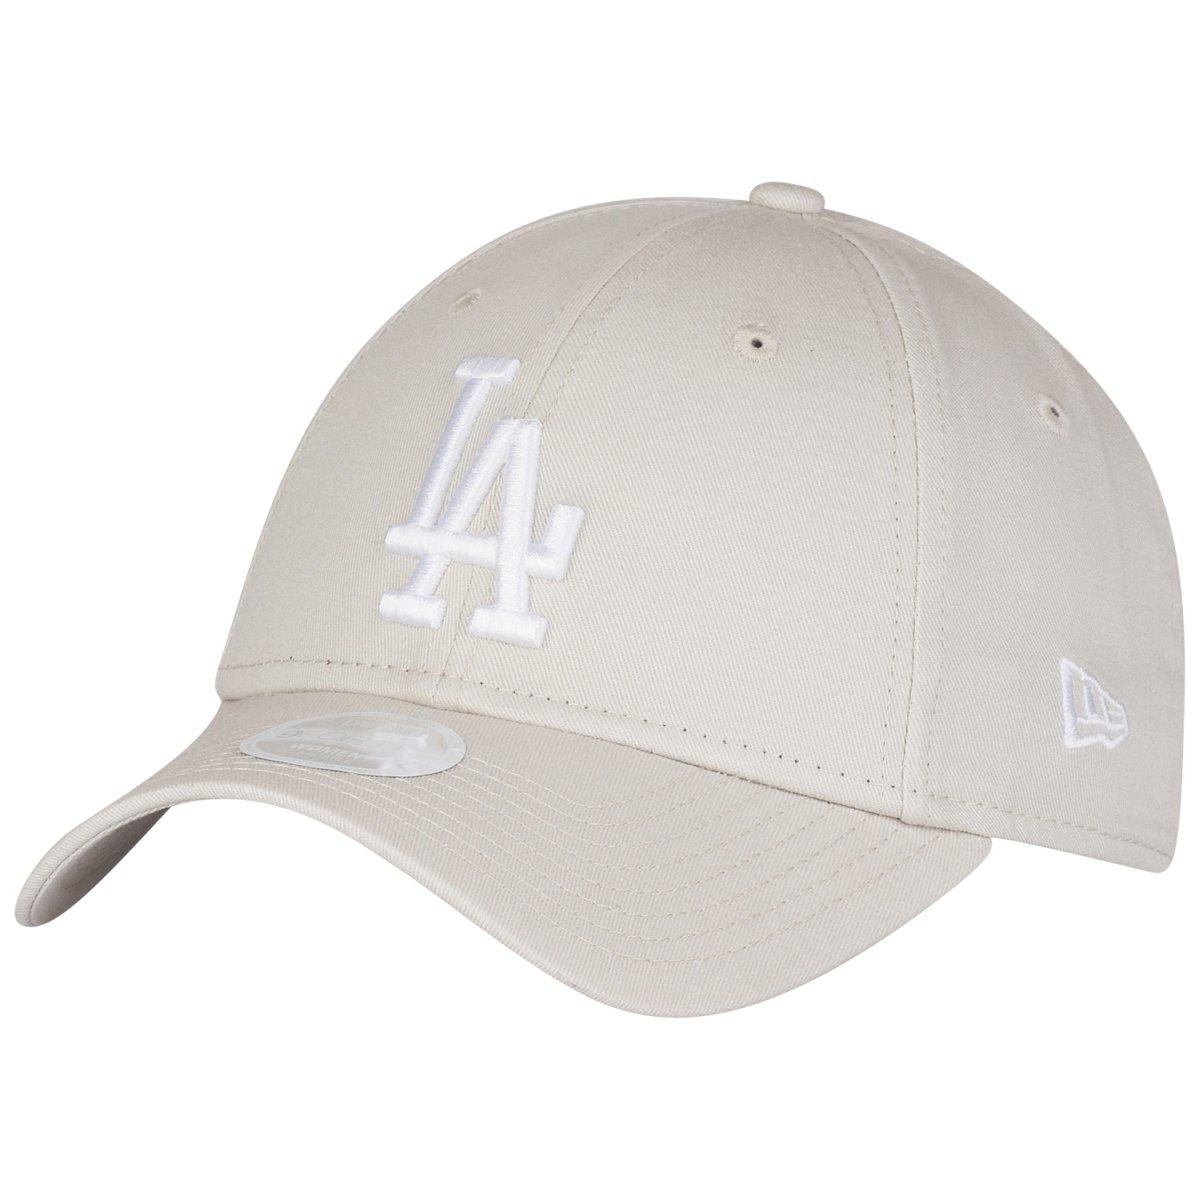 New Era 9Forty Damen Cap - Los Angeles Dodgers hell beige   eBay